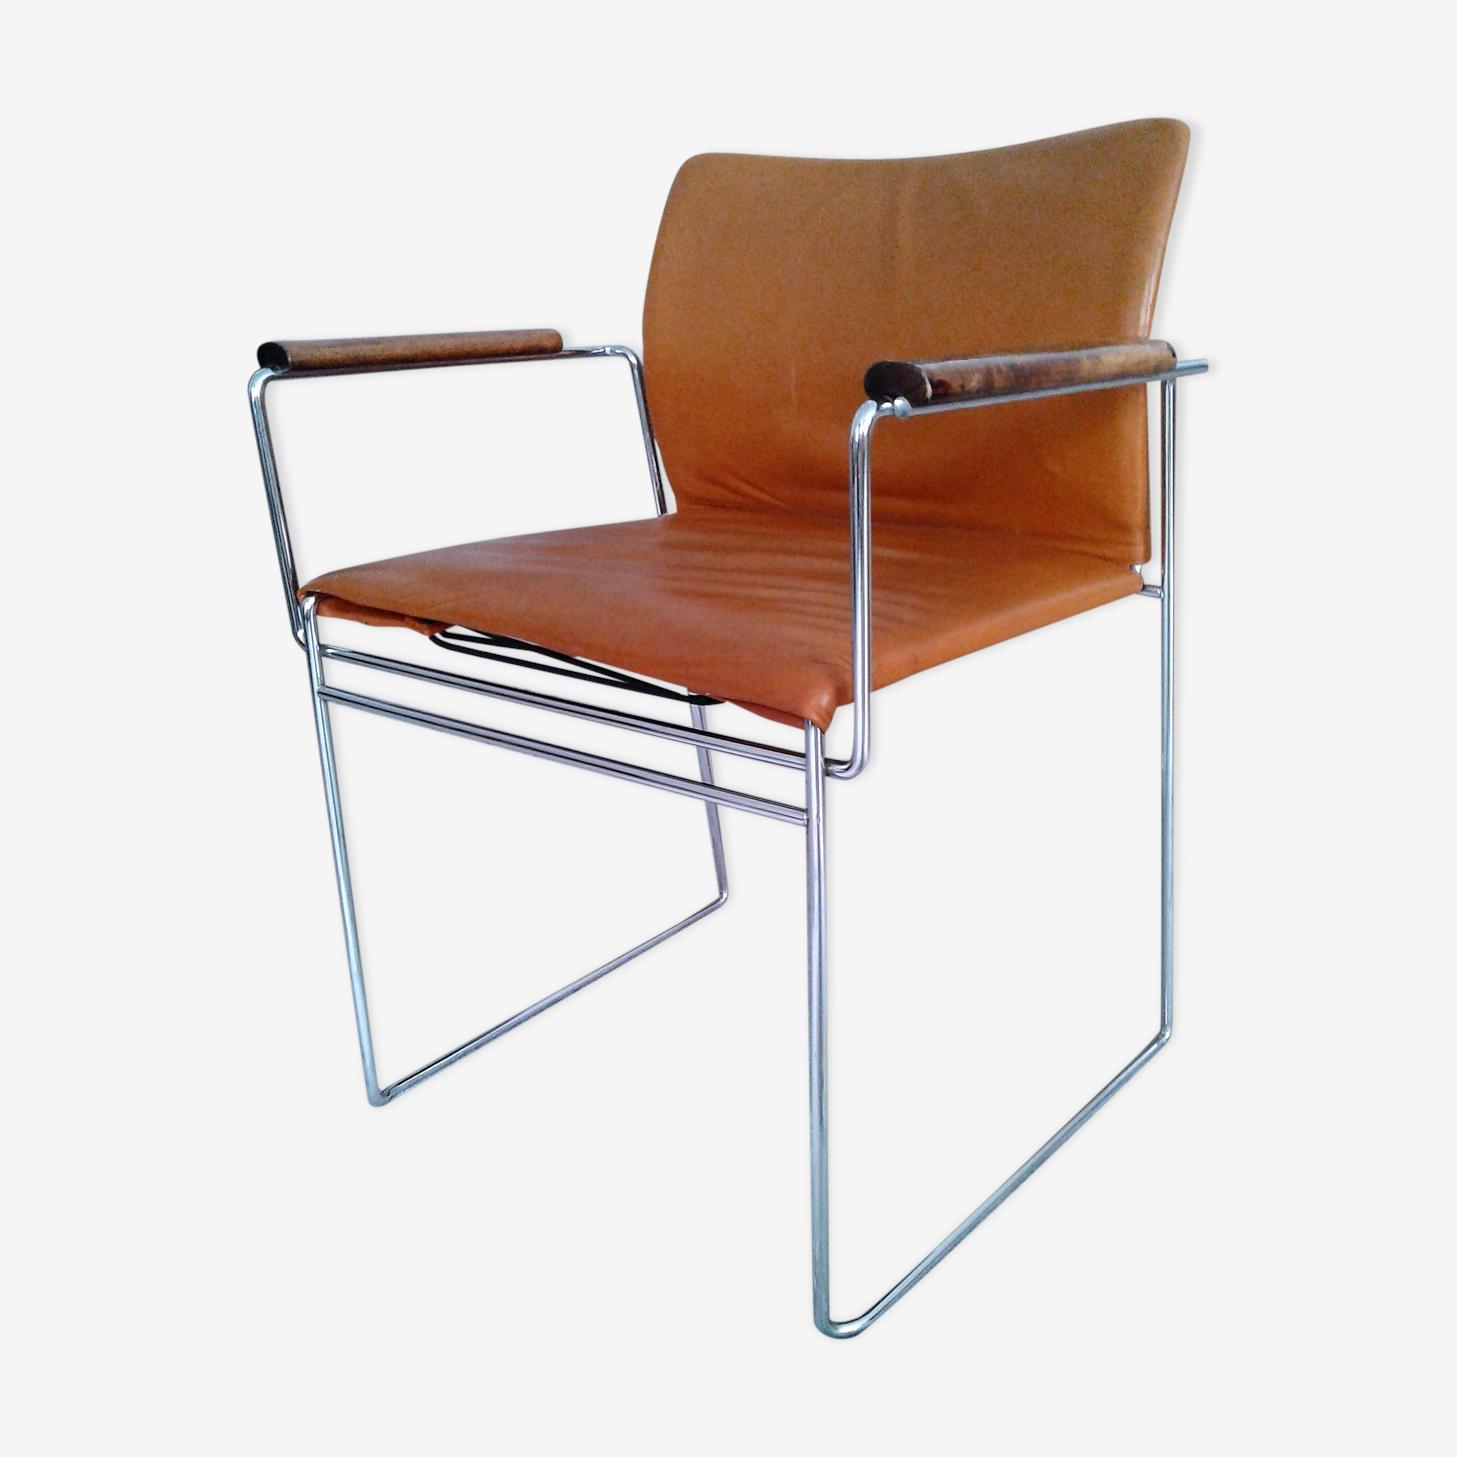 Fauteuil  en cuir Jano LG BR du designer Kazuhide Takahama créé en 1969